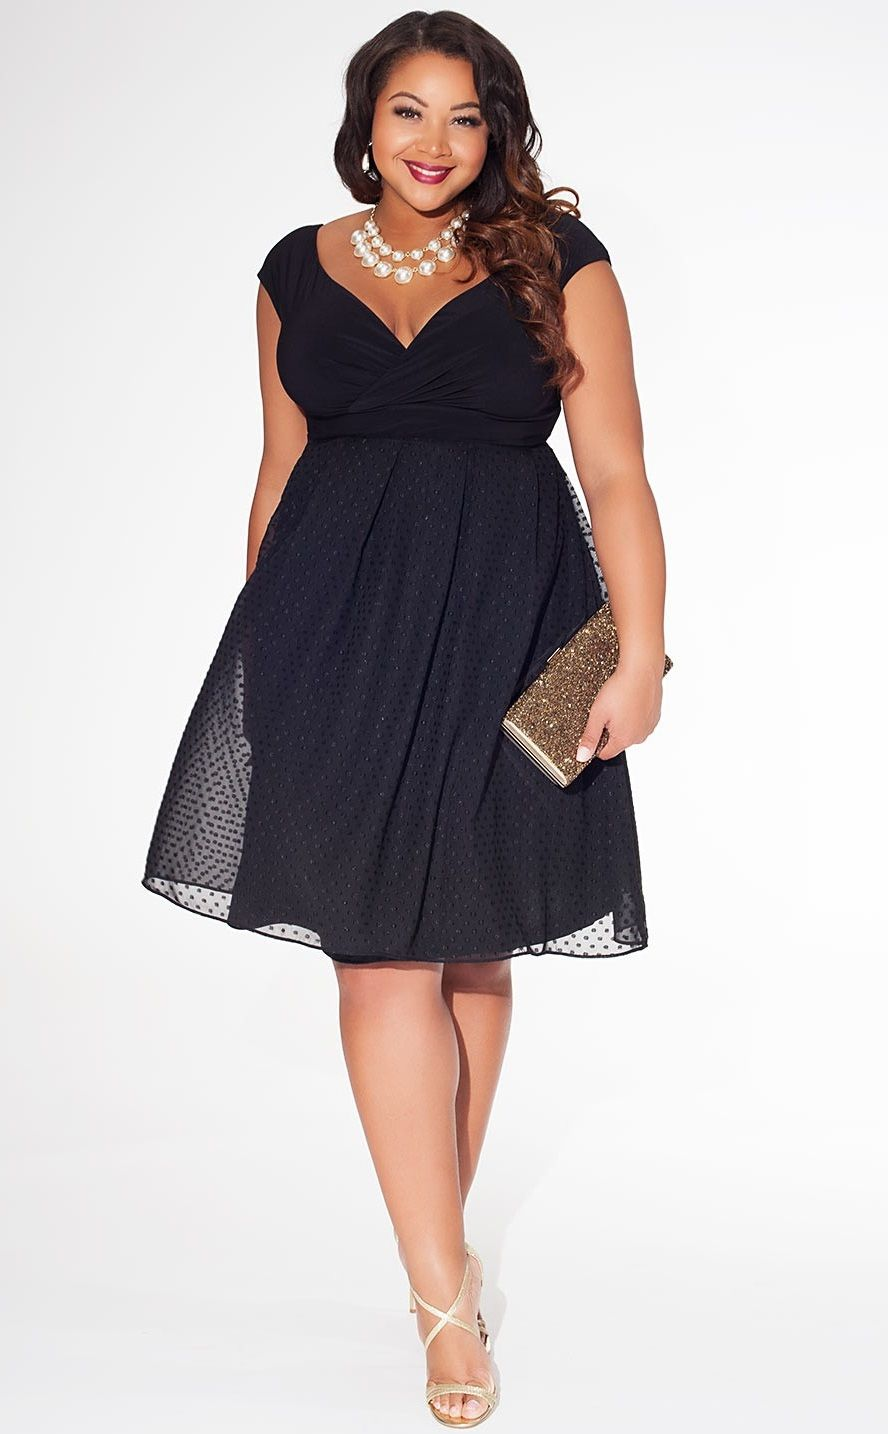 Modelos de vestidos elegantes para senoras gorditas